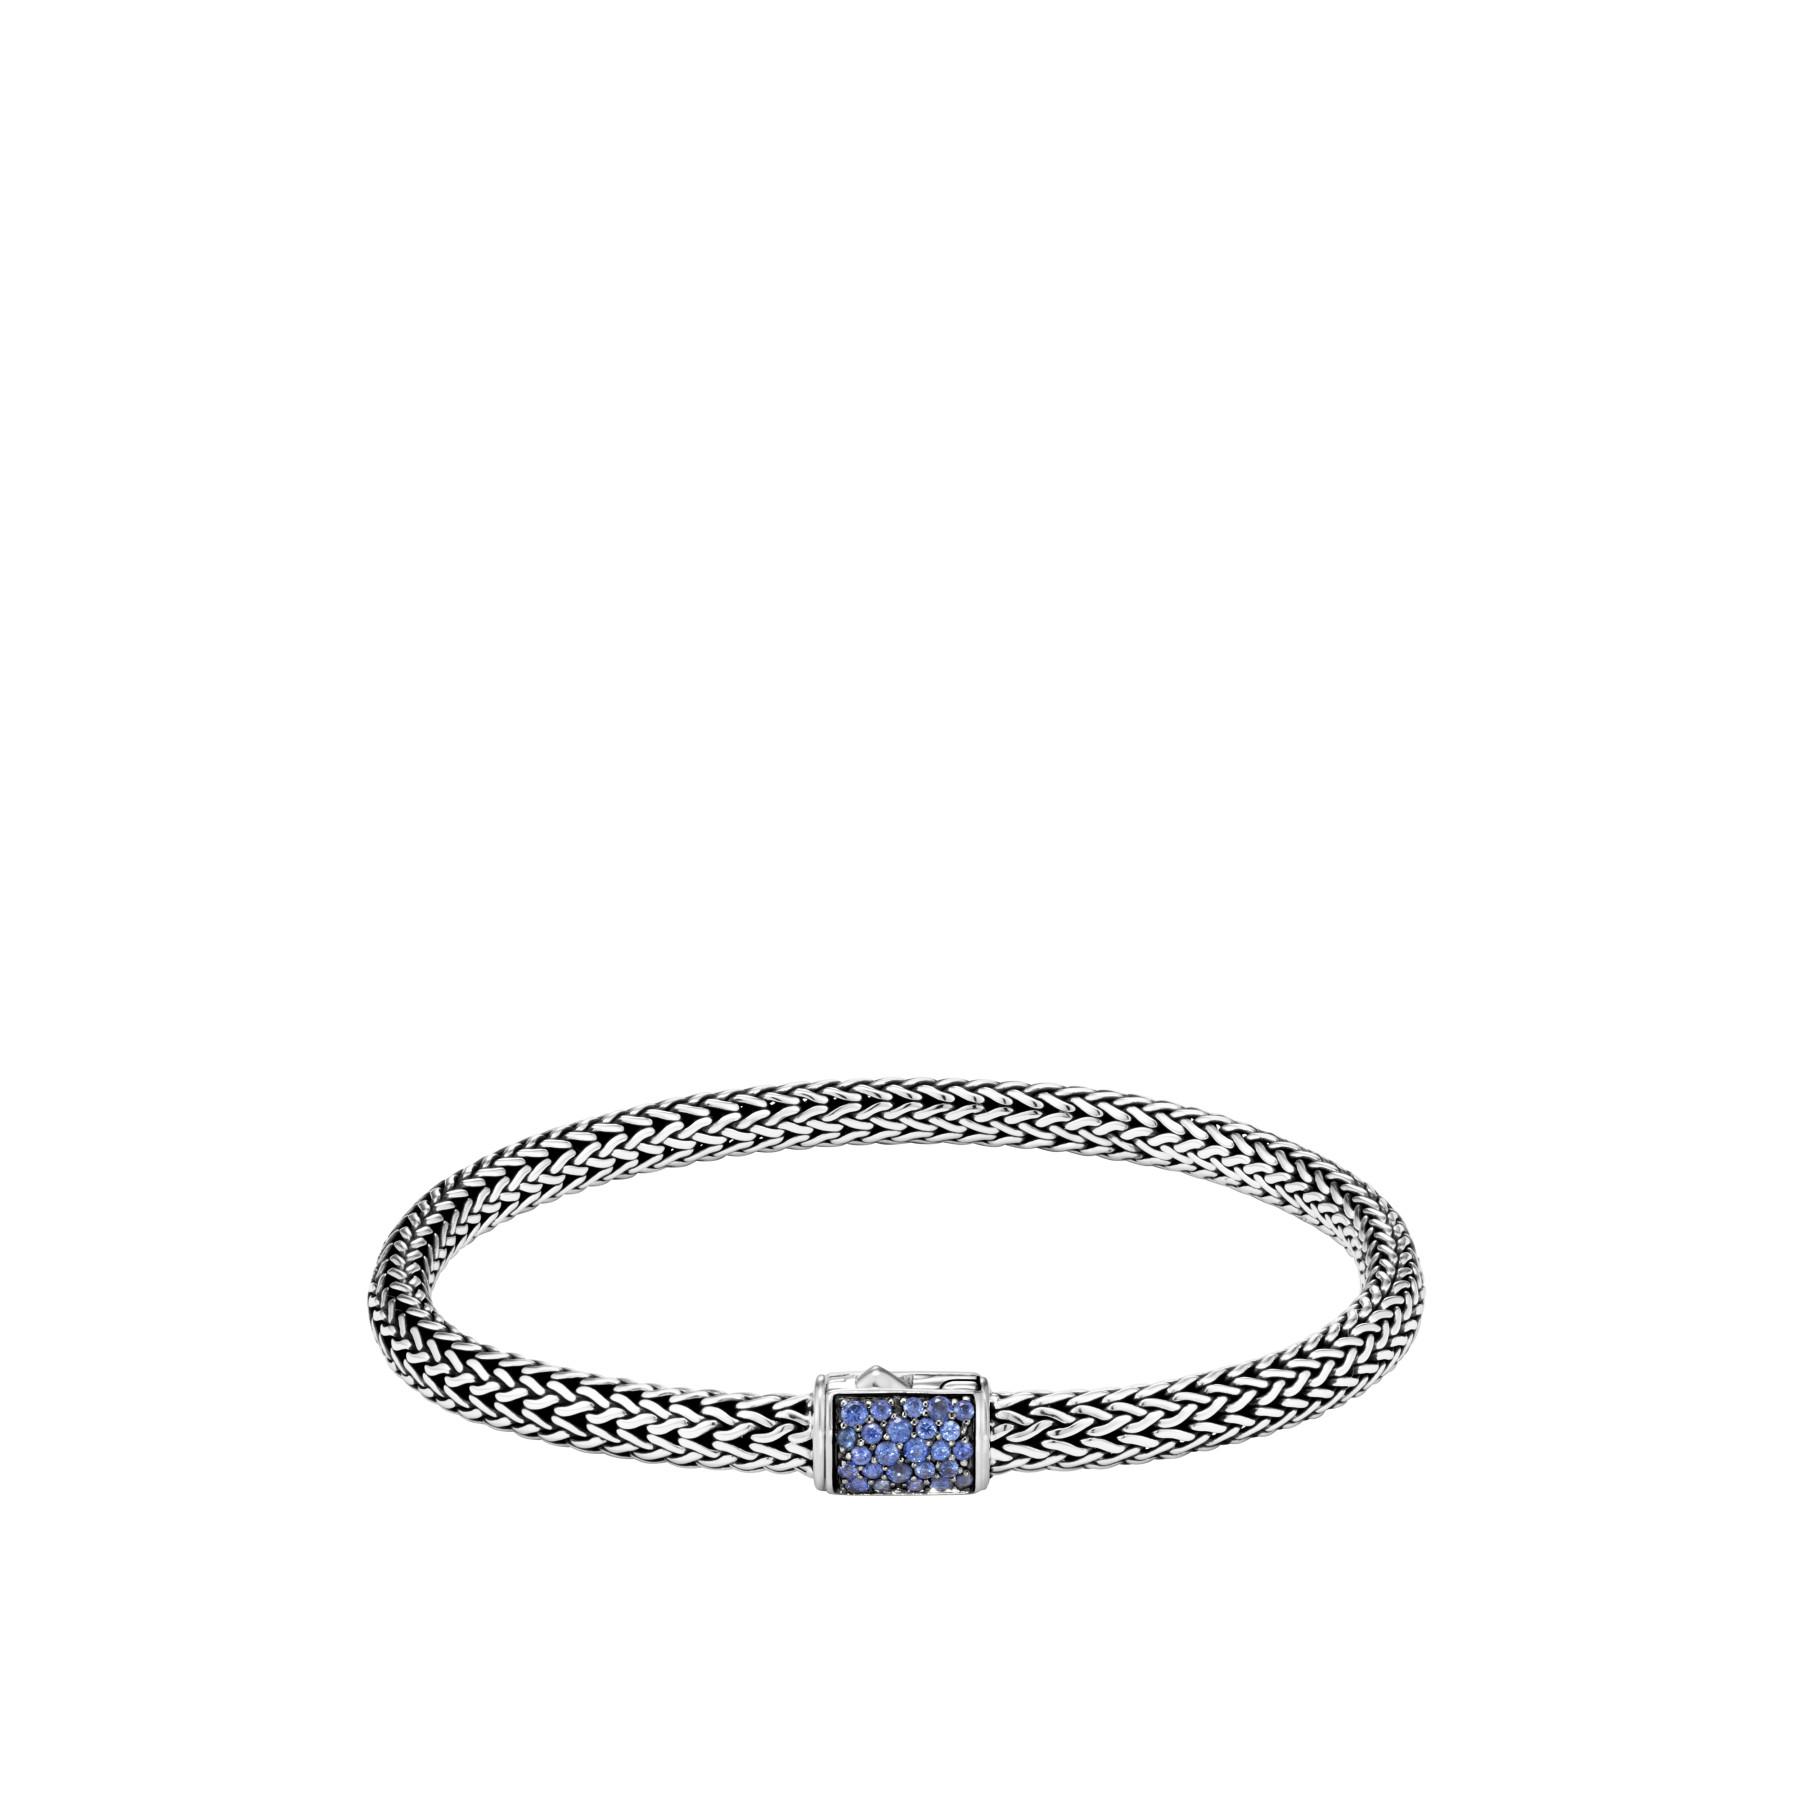 John Hardy Classic Chain Blue Sapphire Reversible Bracelet - 5MM FRONT IMAGE